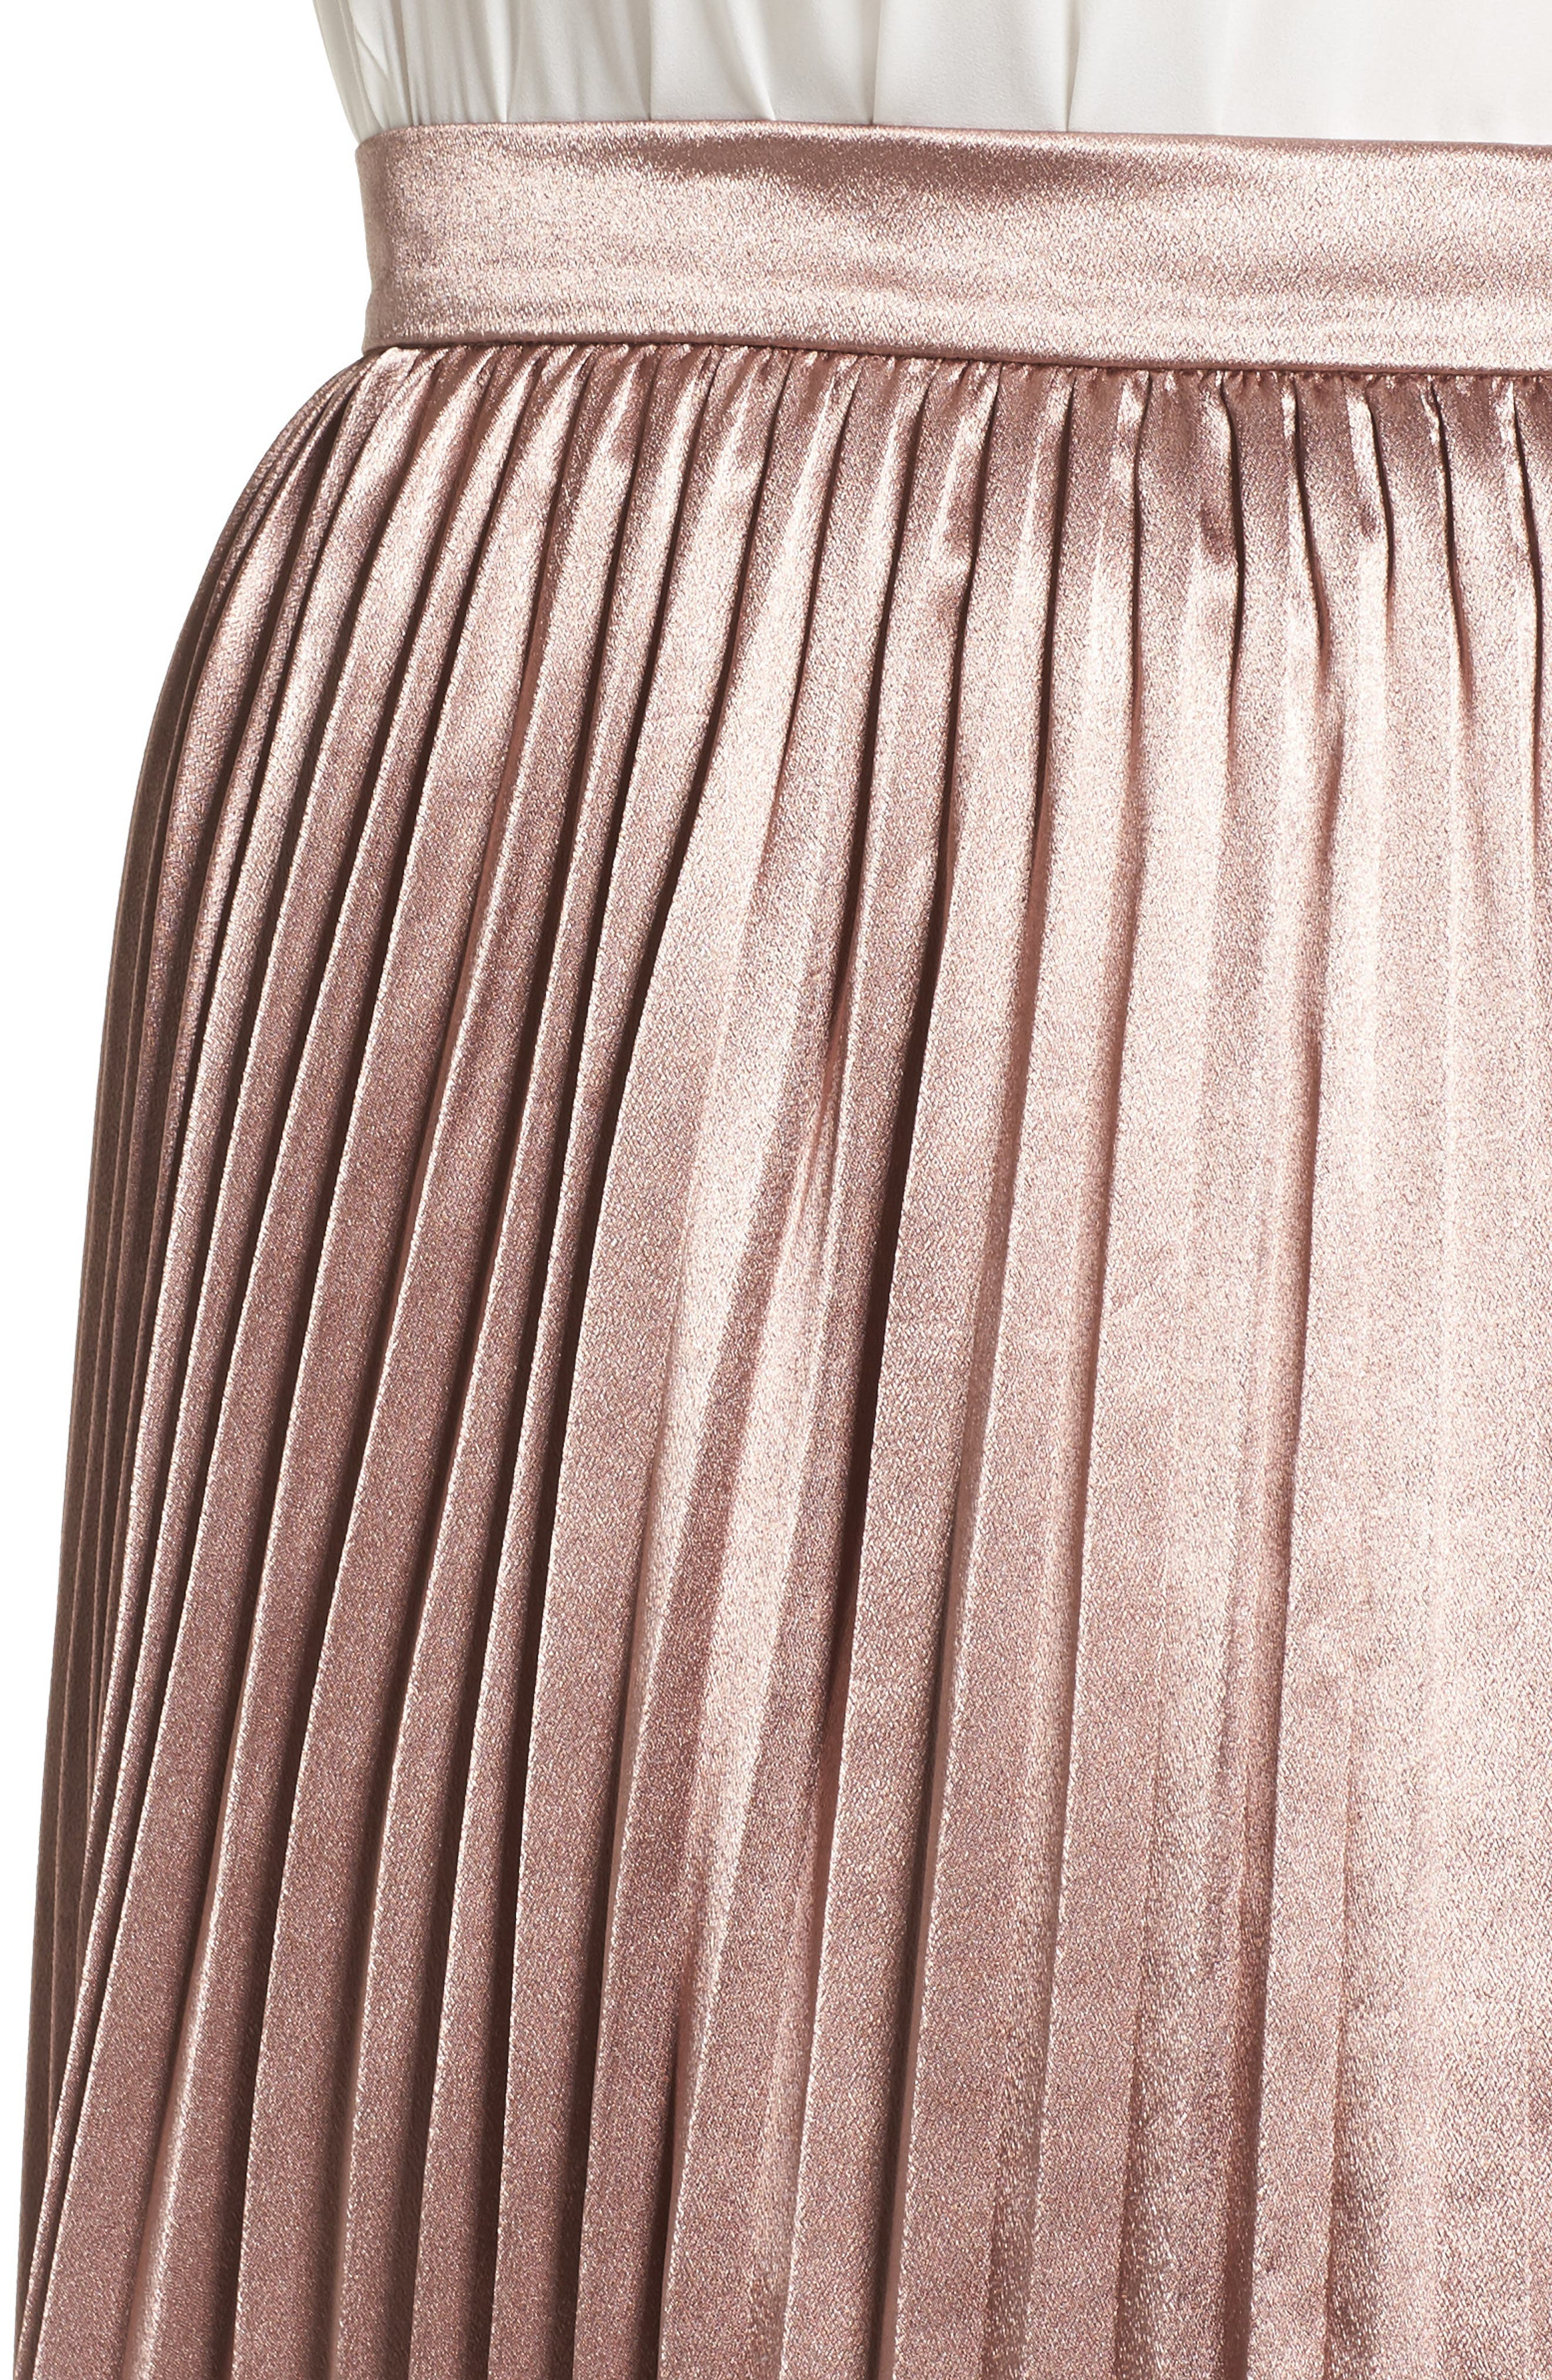 Pleat Metallic Skirt,                             Alternate thumbnail 4, color,                             650